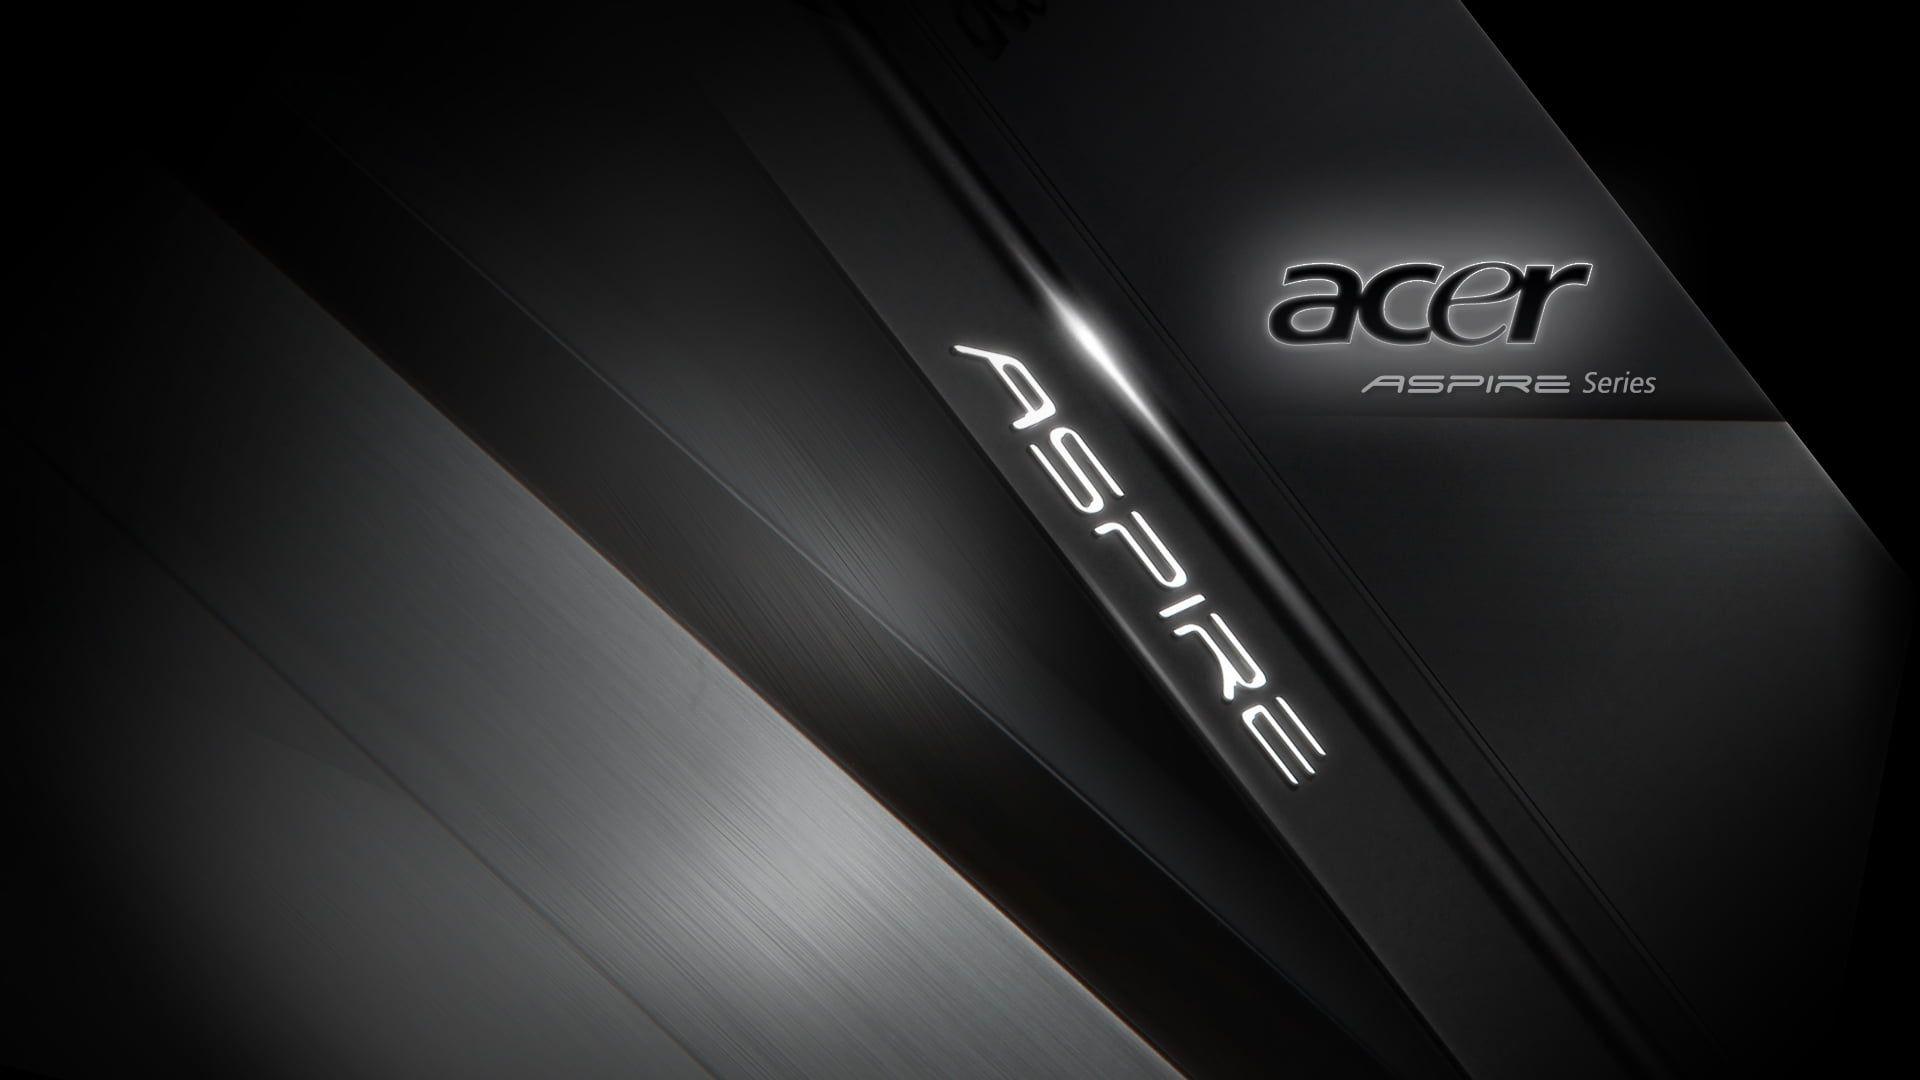 Acer Aspire Brand Acer Acer Official Wallpaper Aspire 1080p Wallpaper Hdwallpaper Desktop In 2021 Acer Aspire Acer Hd Wallpaper Acer black wallpaper hd